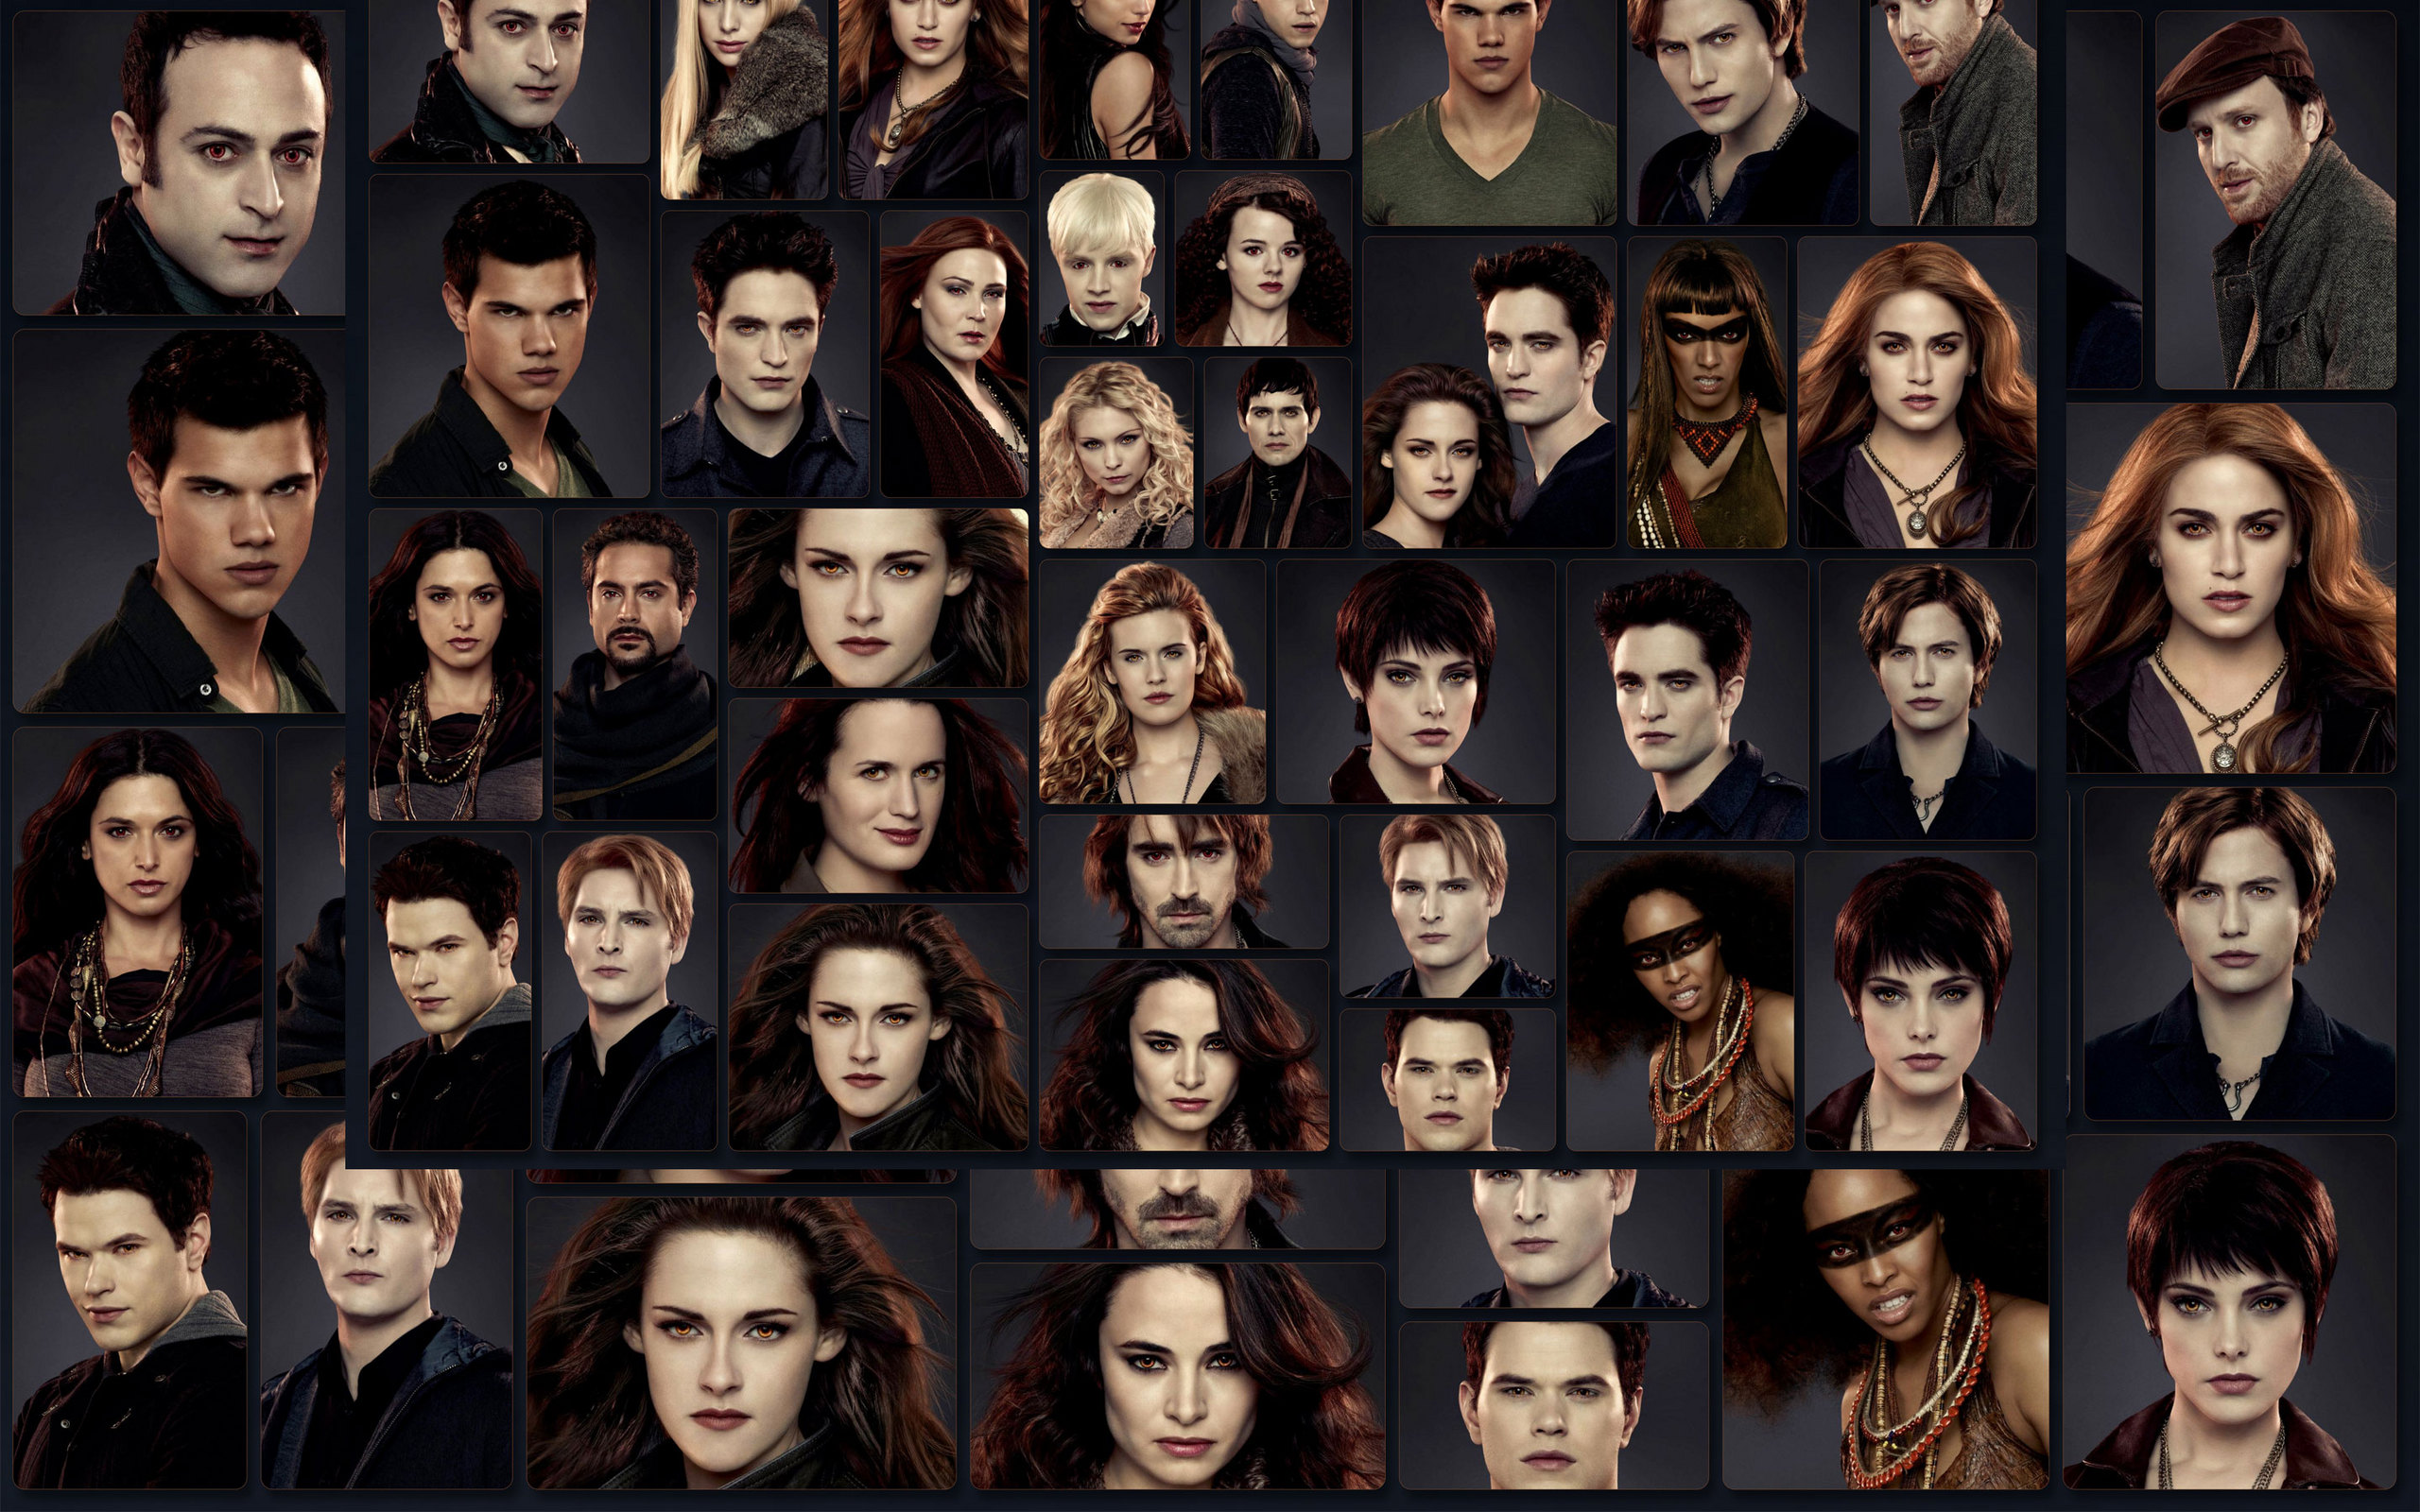 Wallpaper Blink The Twilight Saga Breaking Dawn Part